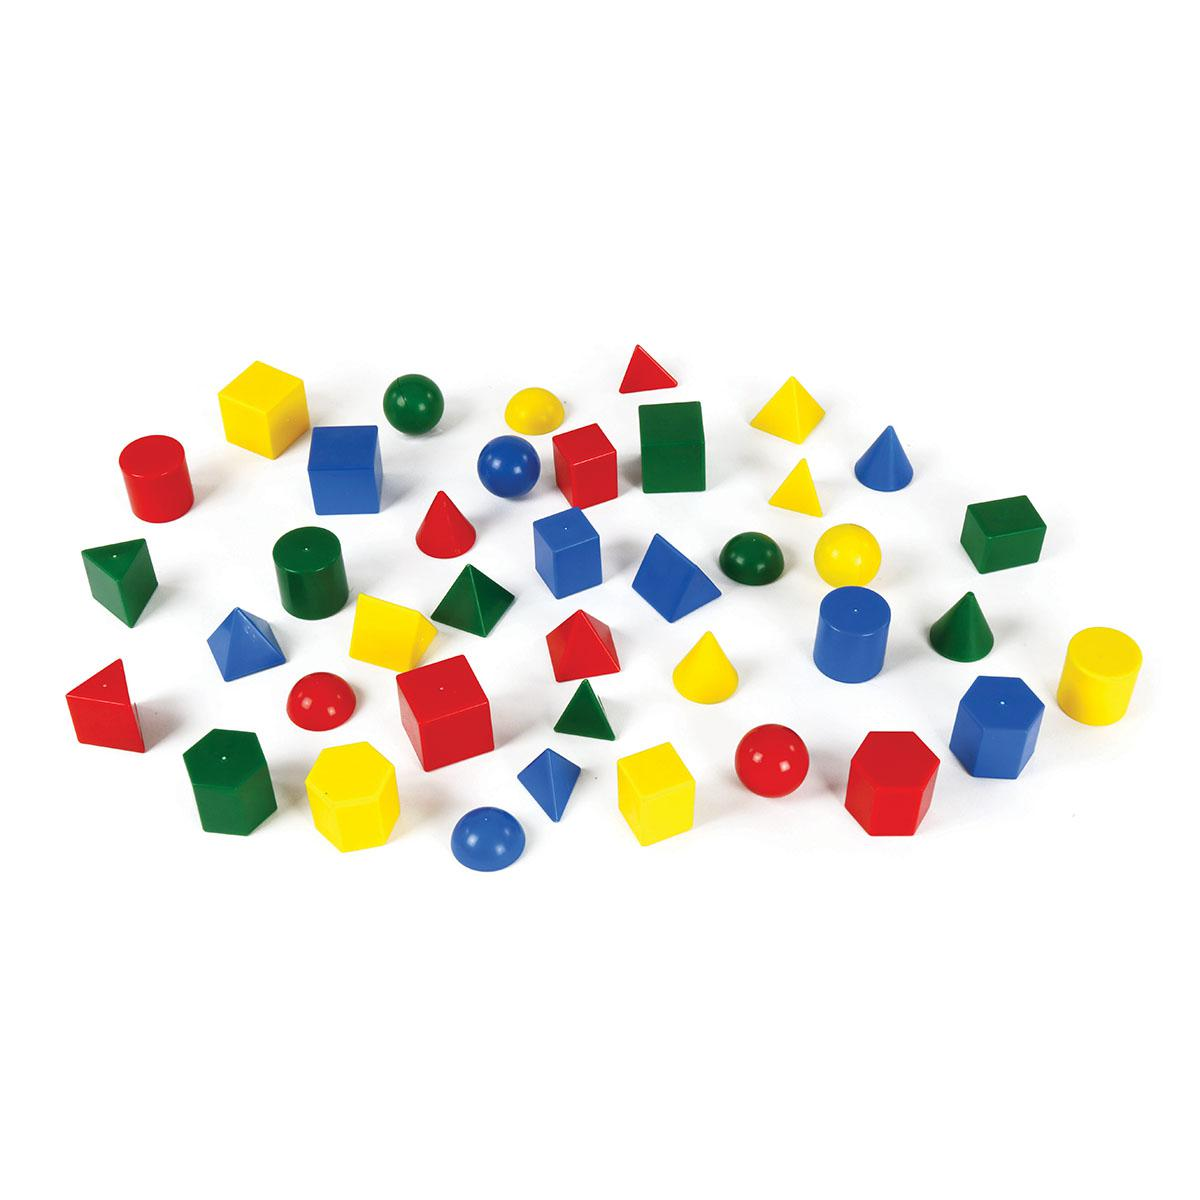 Geometric Solids 40 Pieces